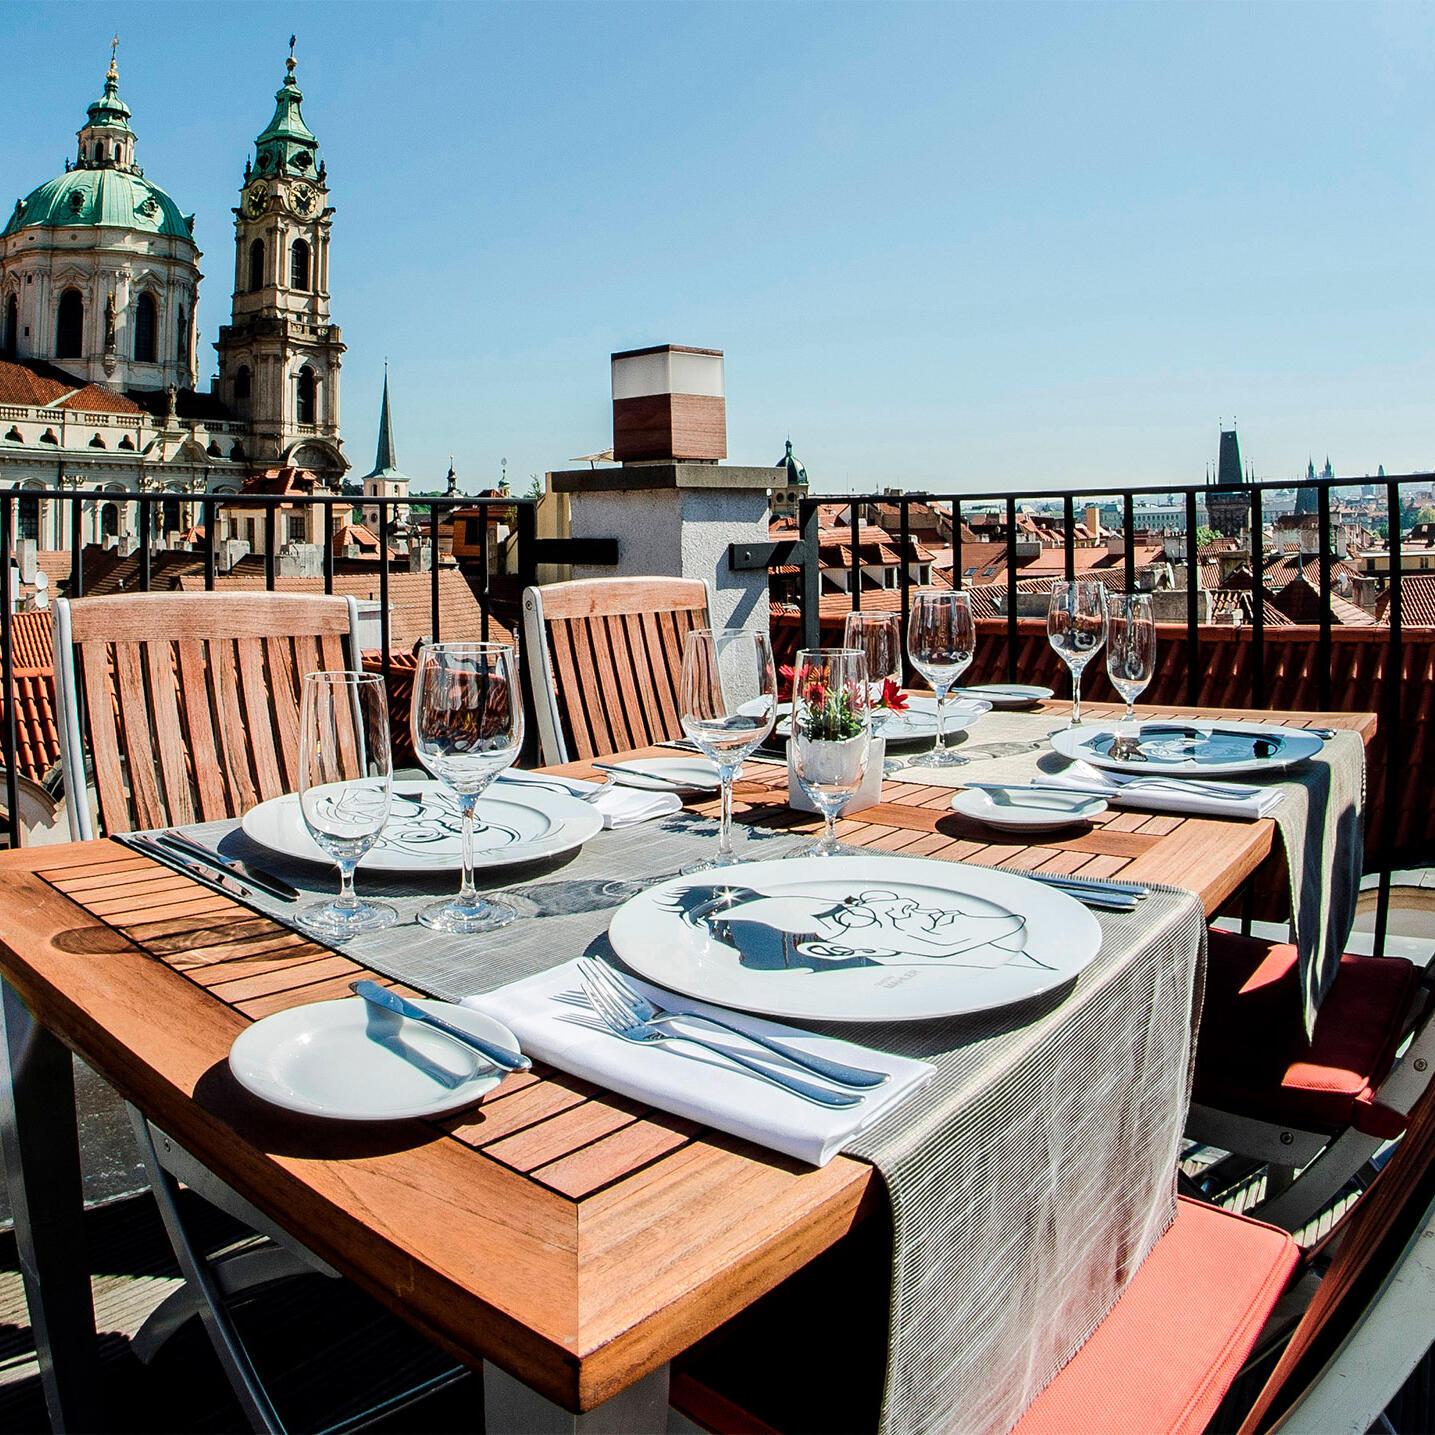 Rooftop terrace is open